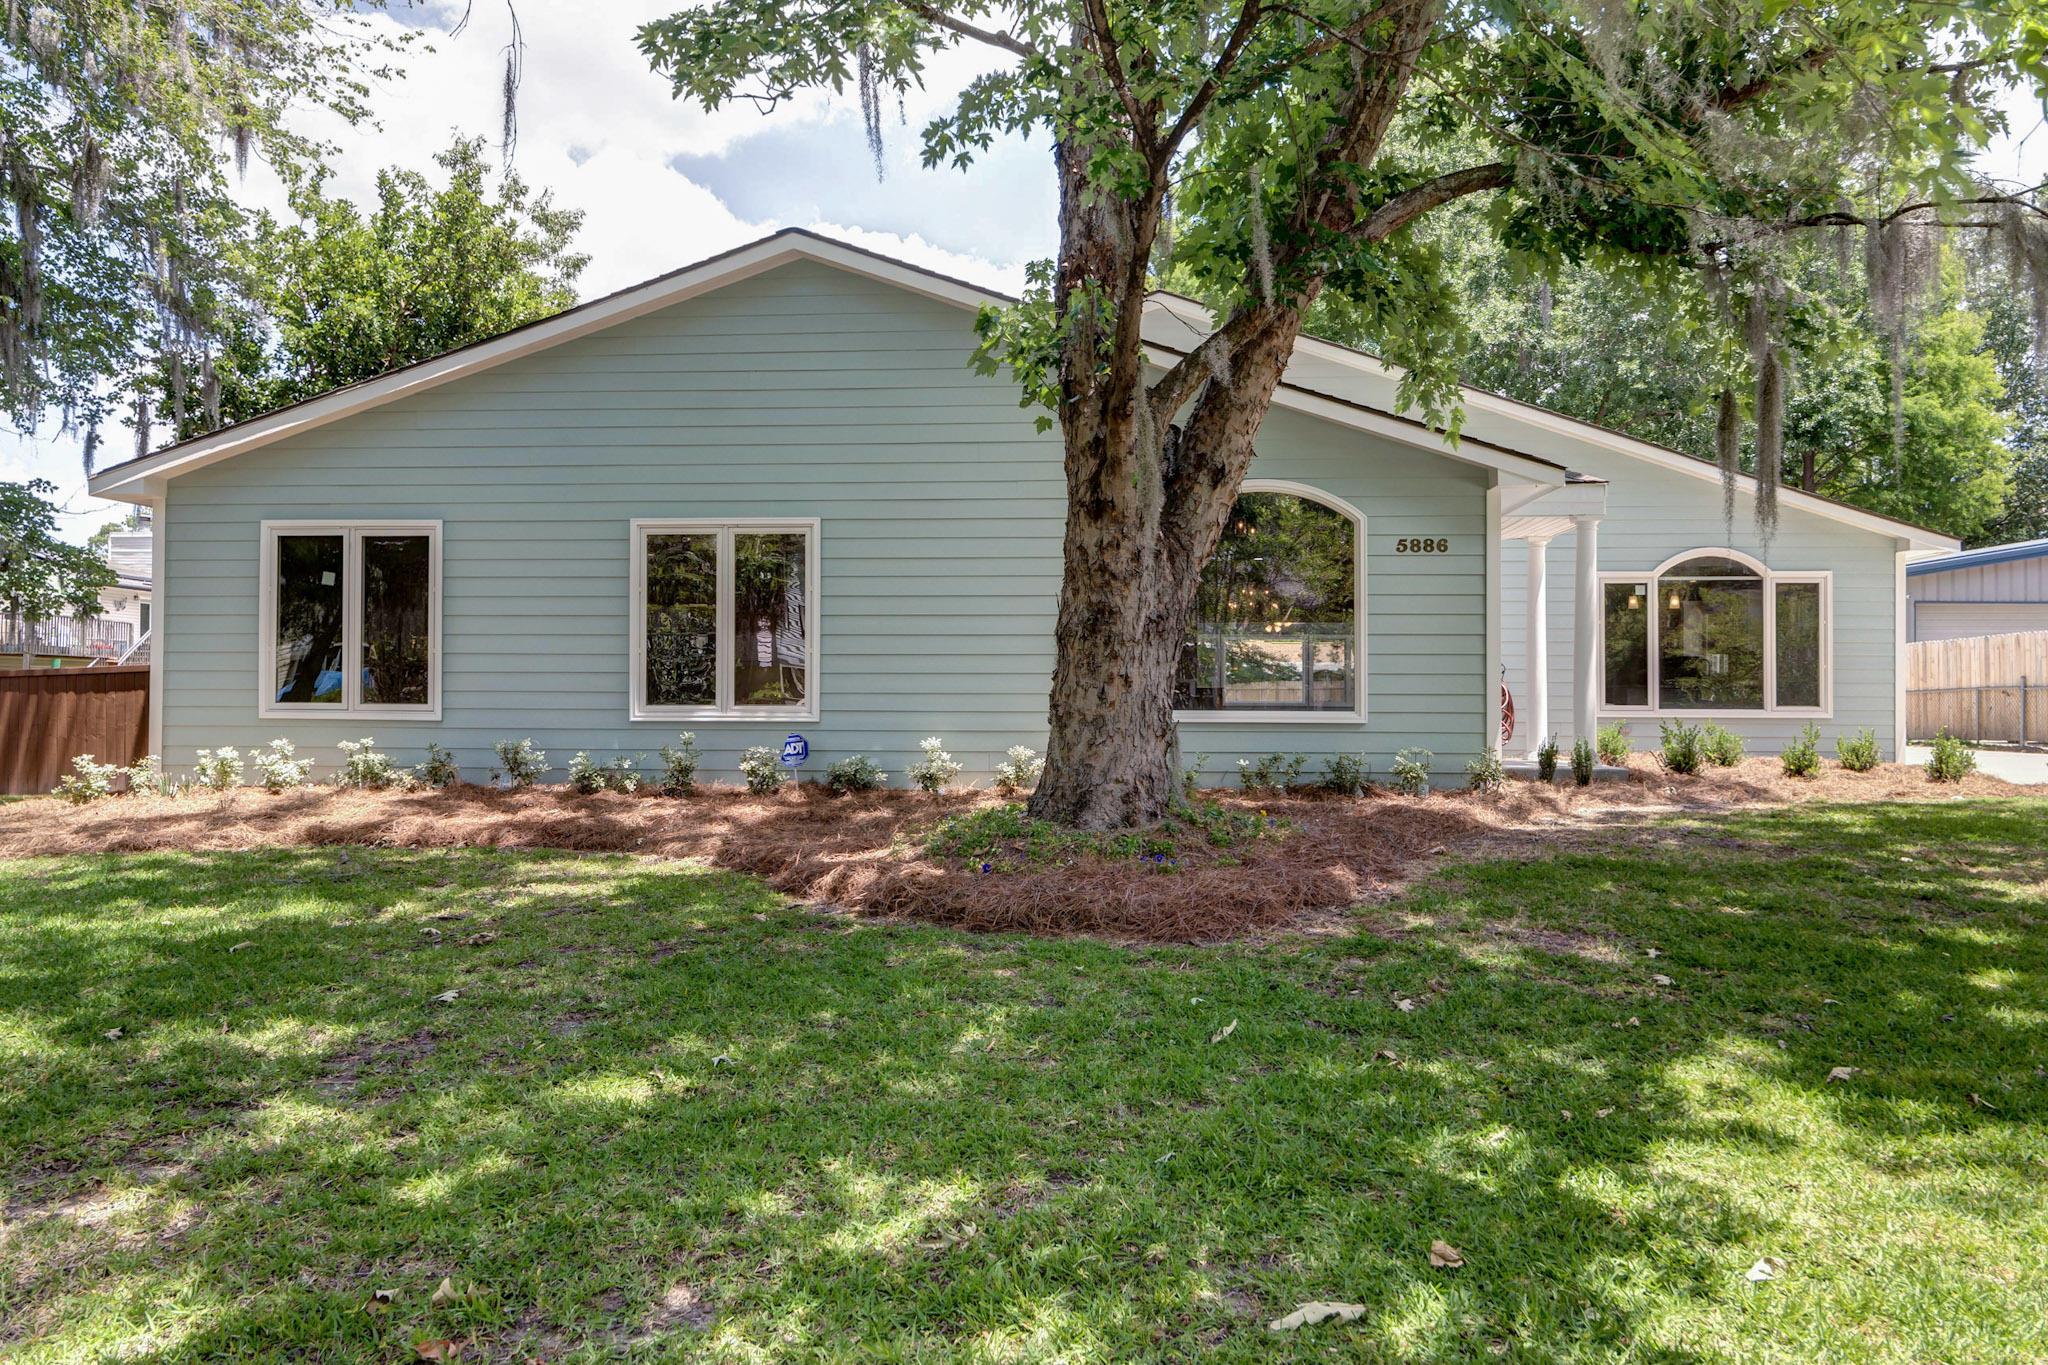 Covington Hills Homes For Sale - 5886 Ryans Bluff, North Charleston, SC - 2